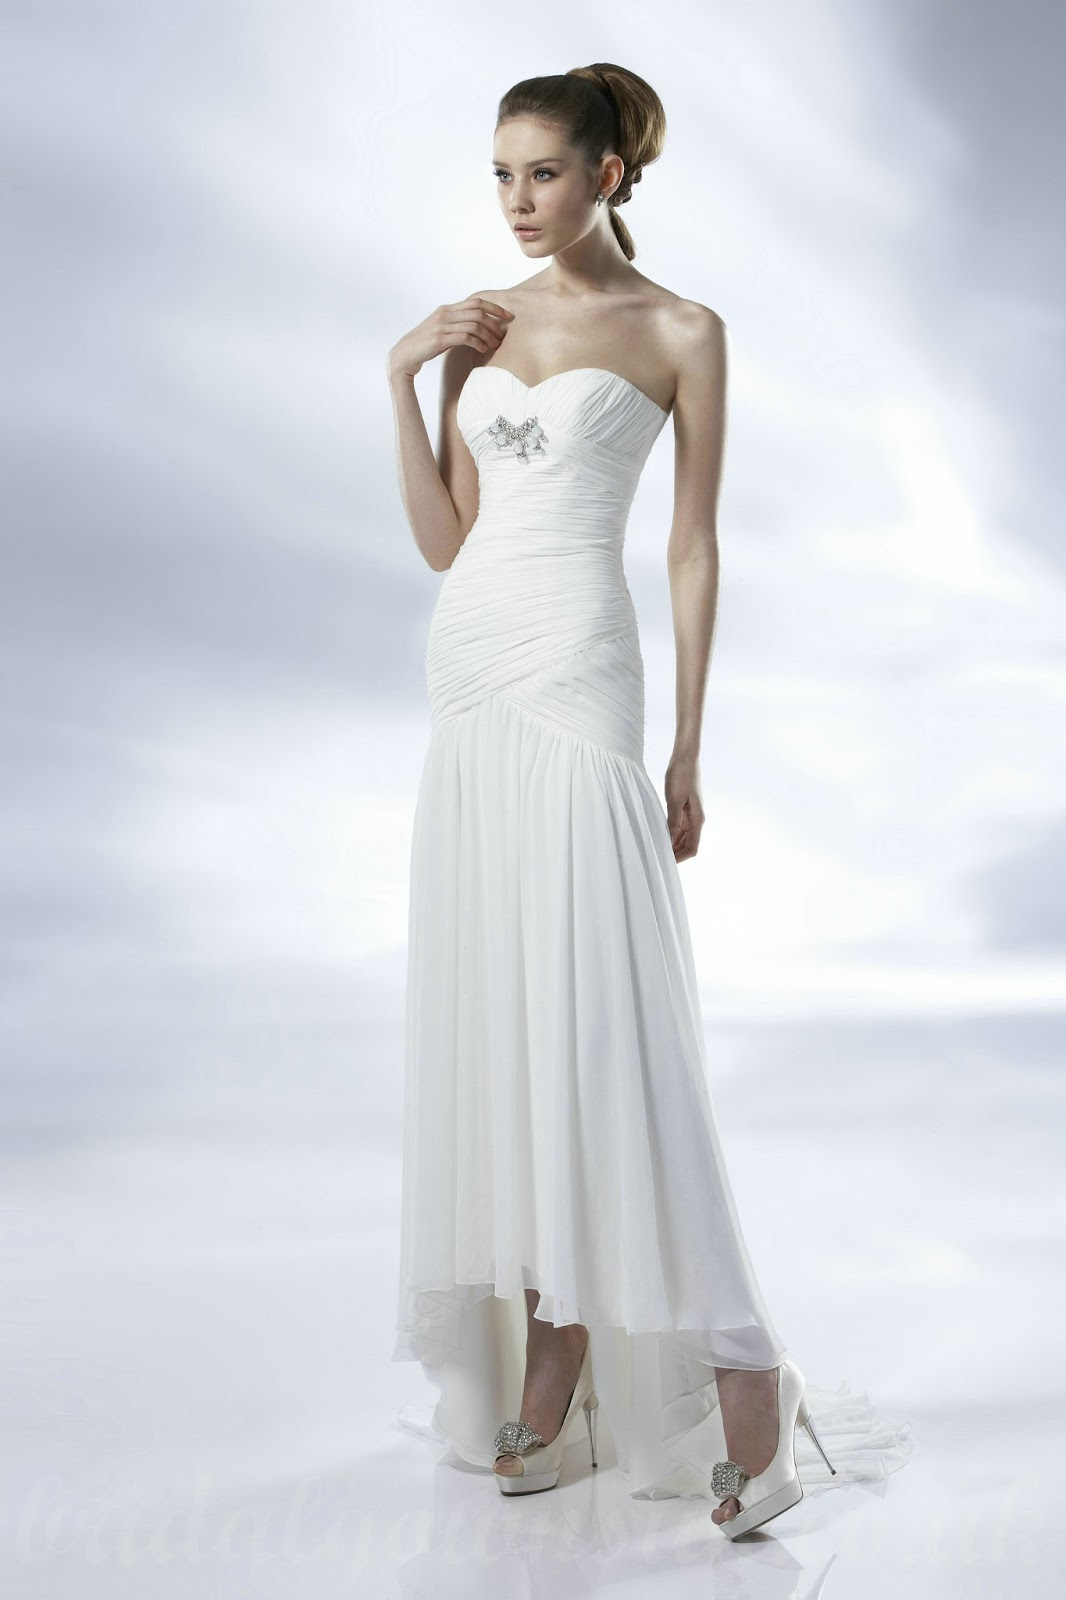 Wedding Dress Collections: Very Cheap Wedding Dresses